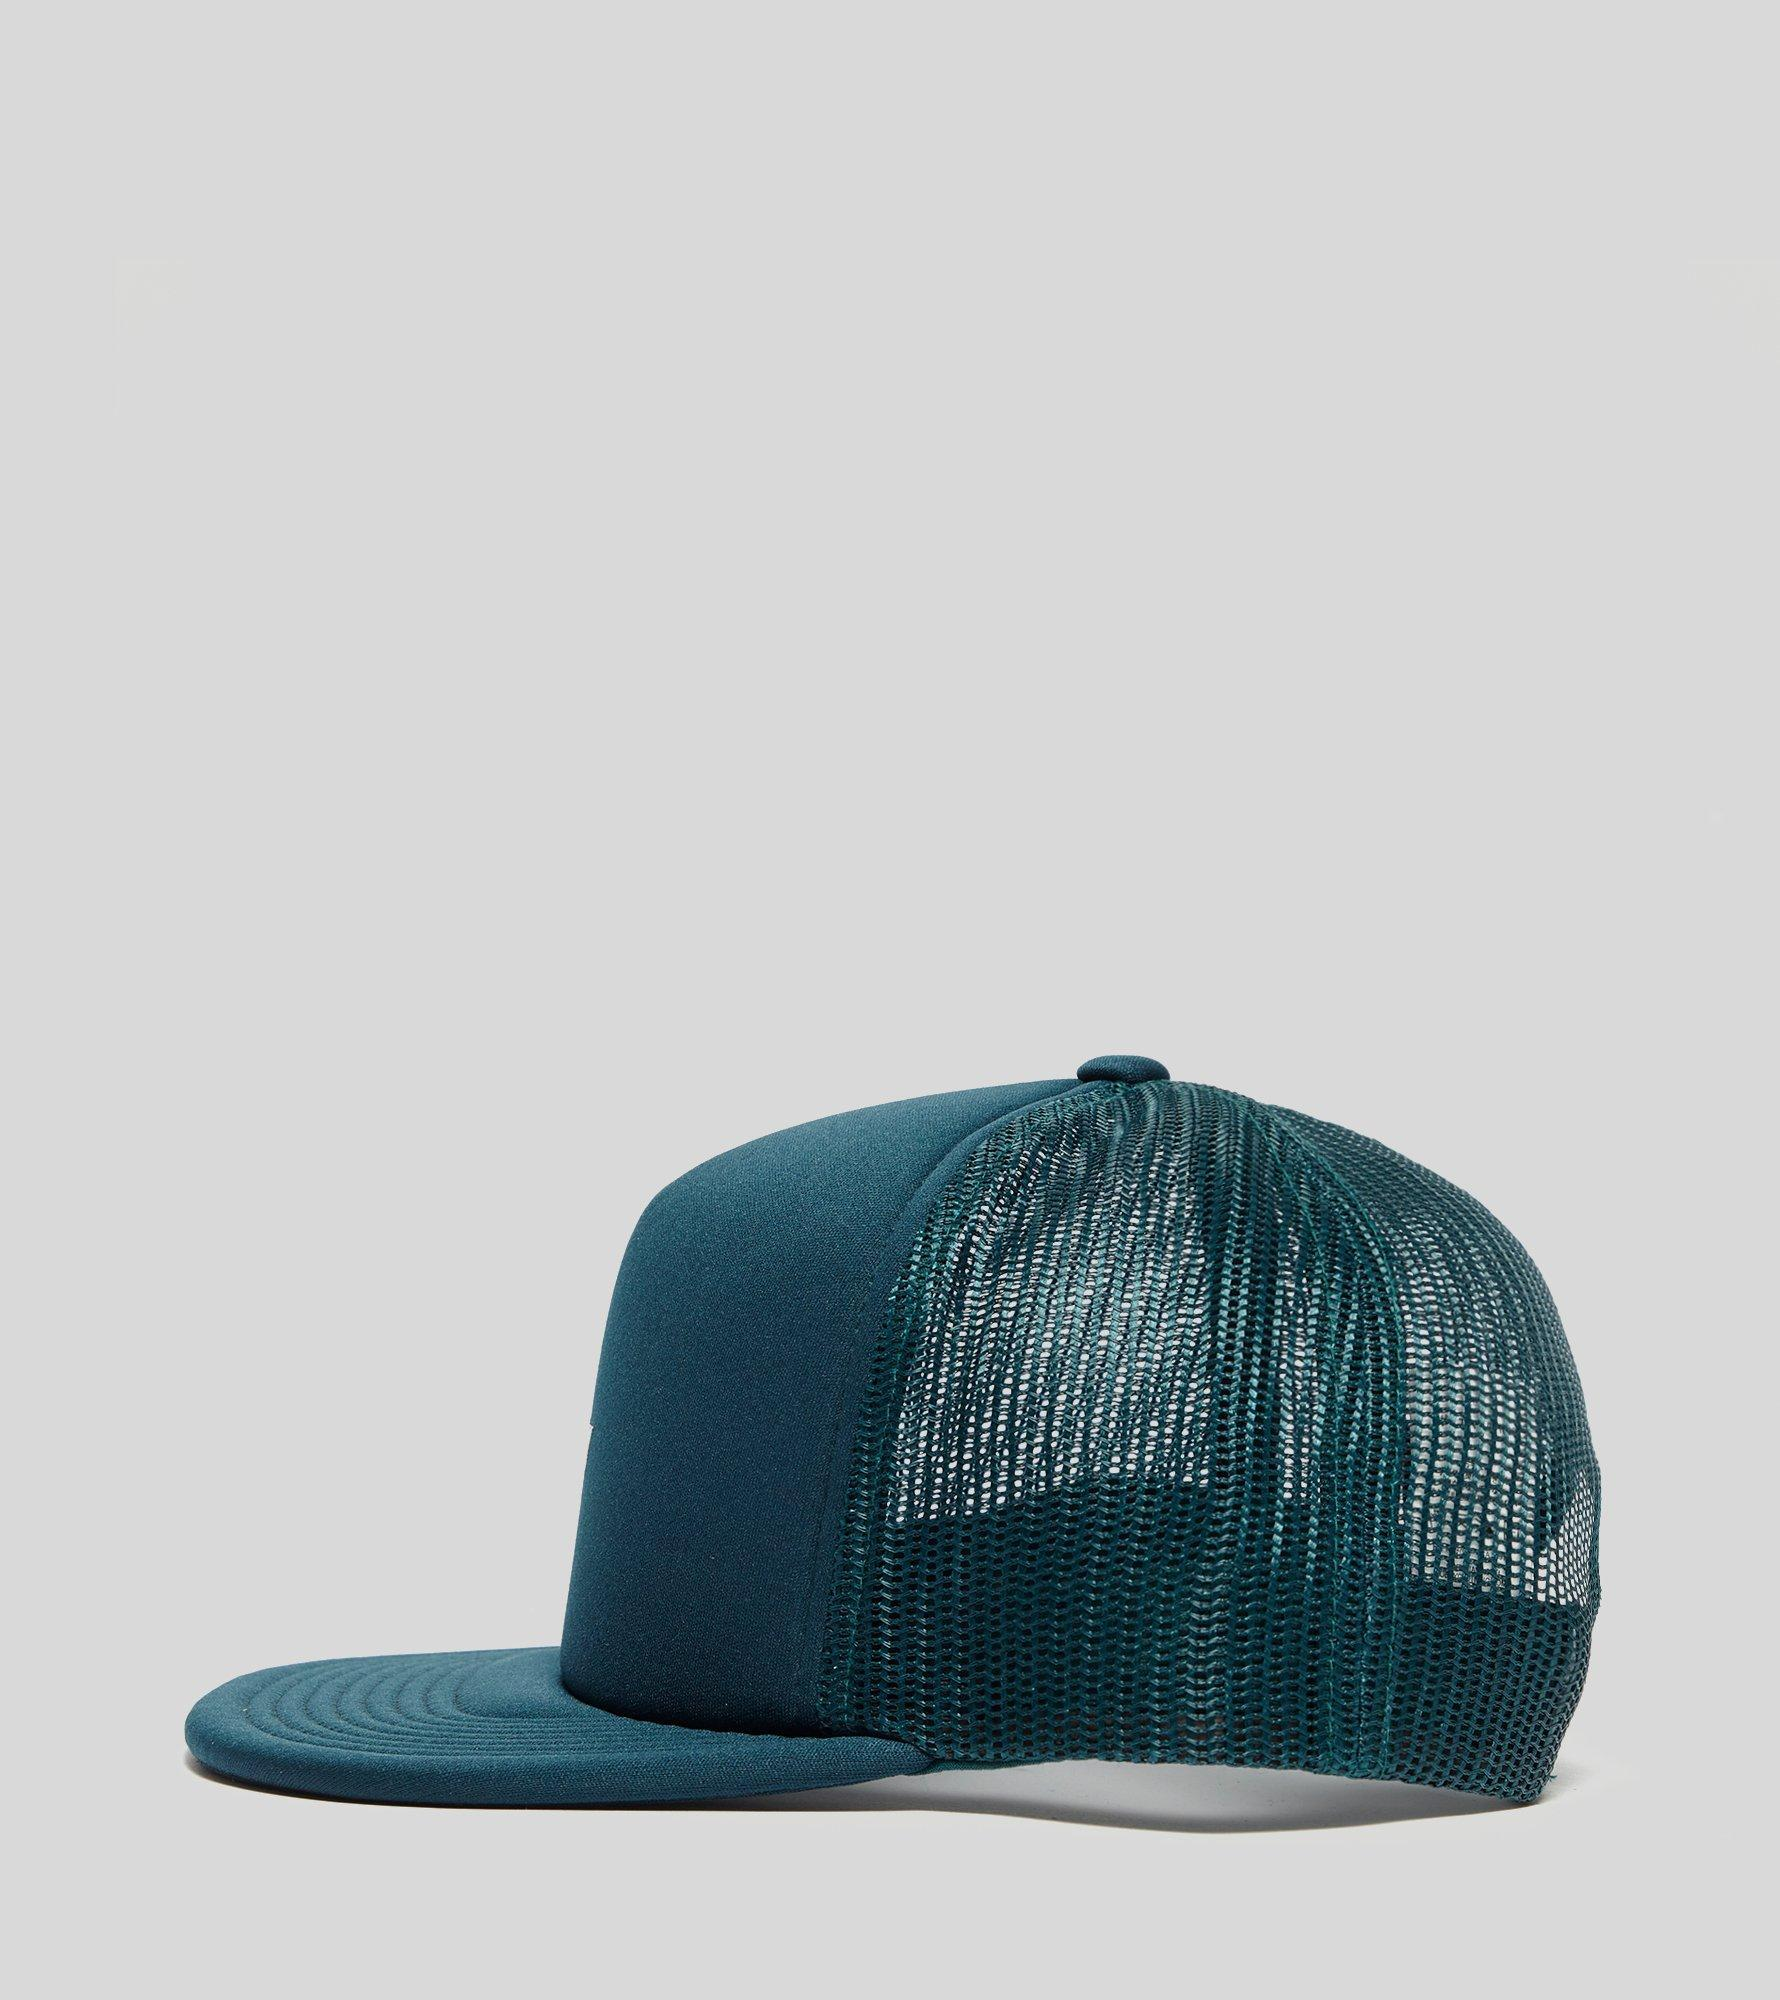 low priced 84744 37ddd Obey Jumble Bar Trucker Cap in Blue for Men - Lyst